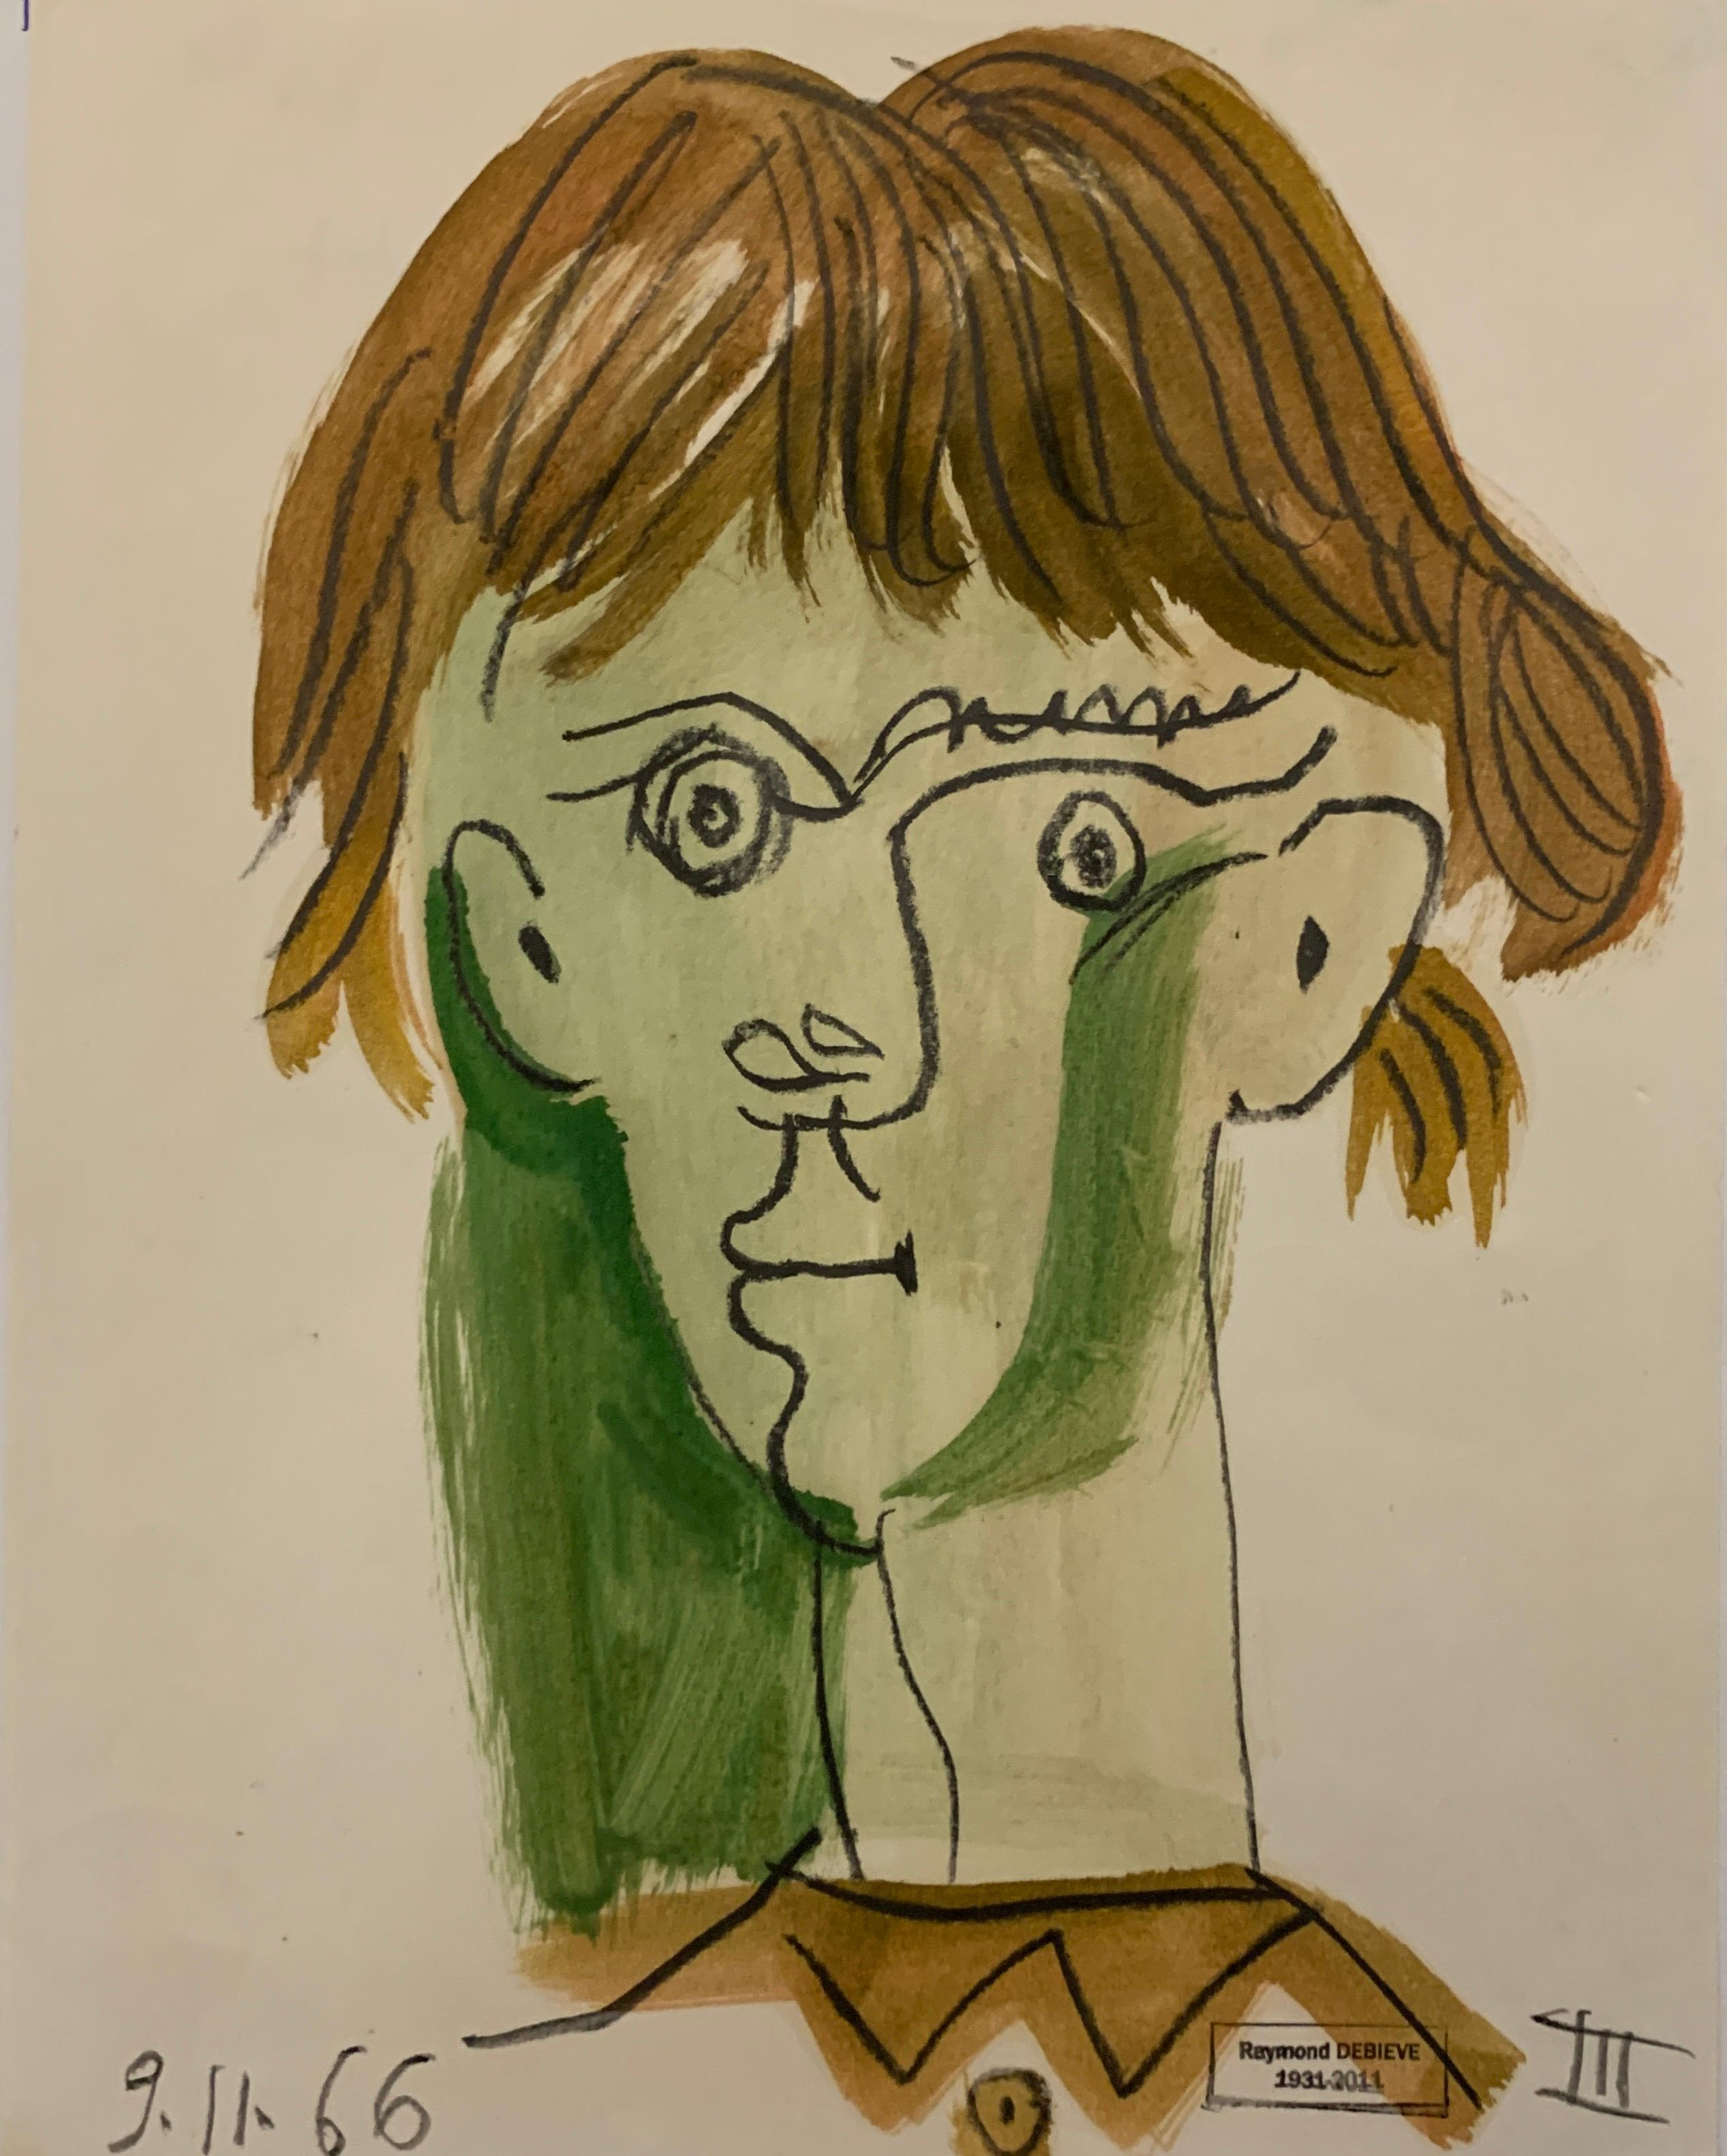 Cheveux Bruns Court by Raymond Debieve, French Cubist Portrait on Paper